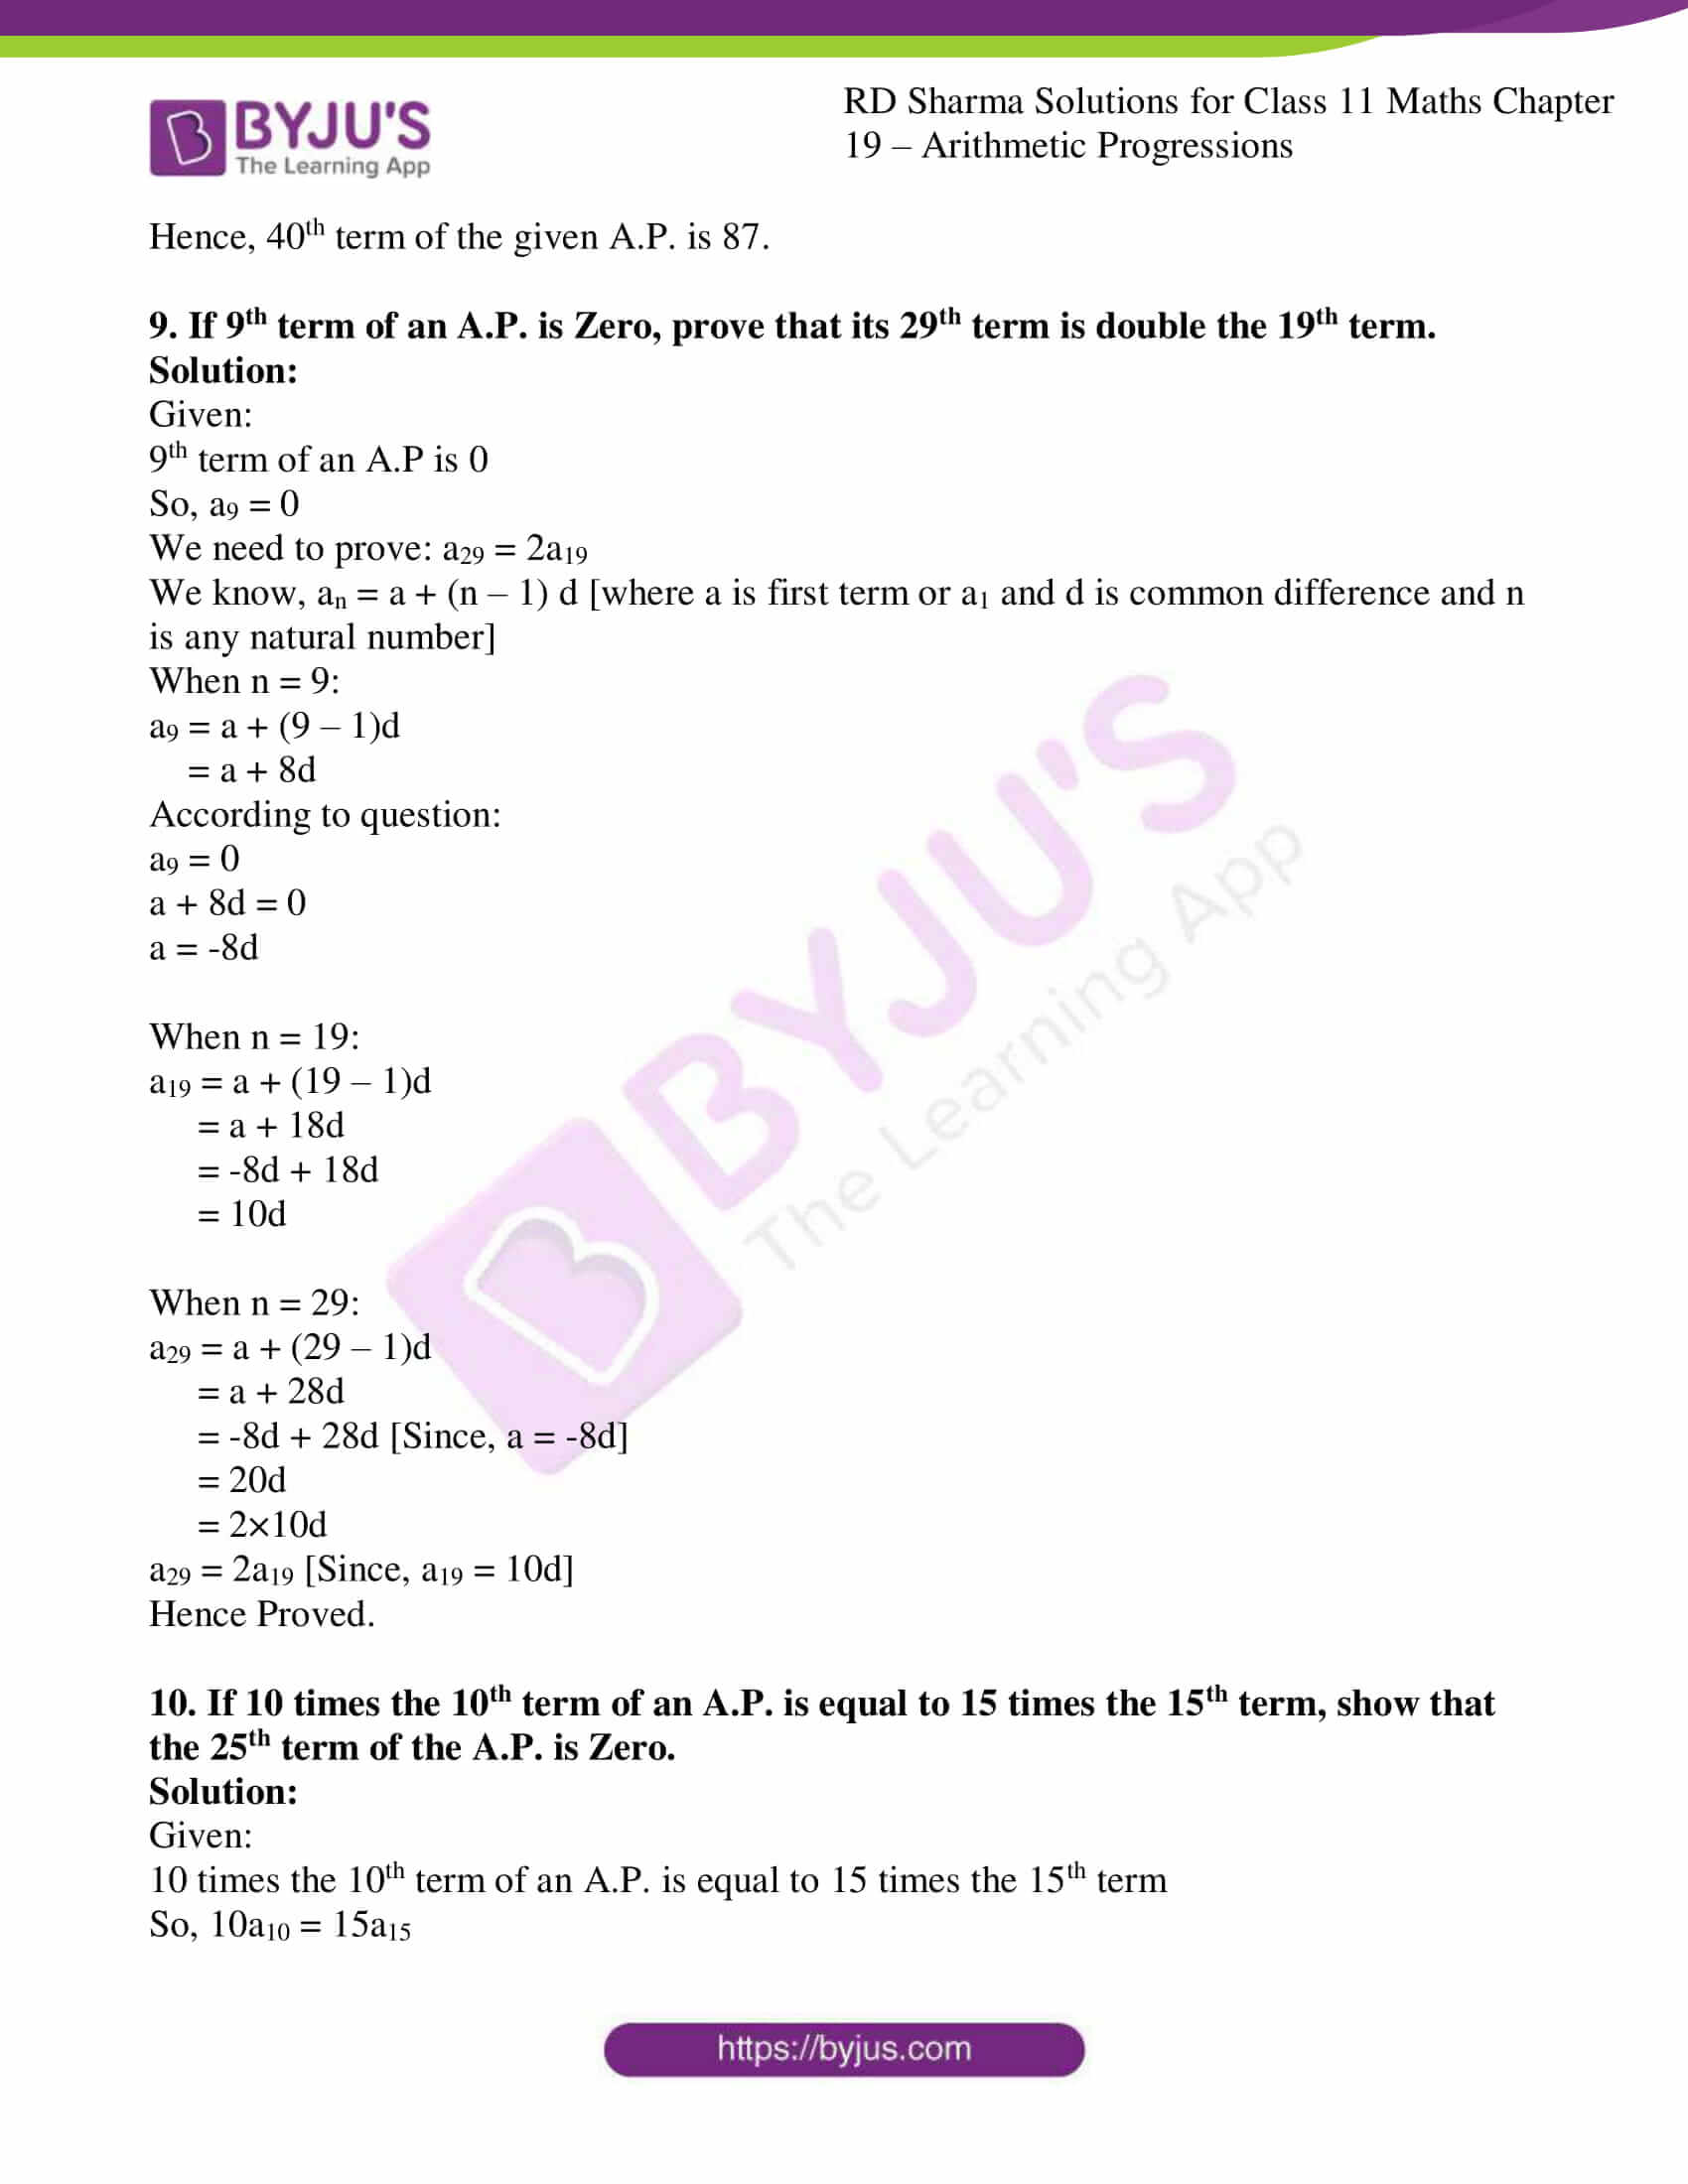 rd sharma class 11 maths ch 19 ex 2 09